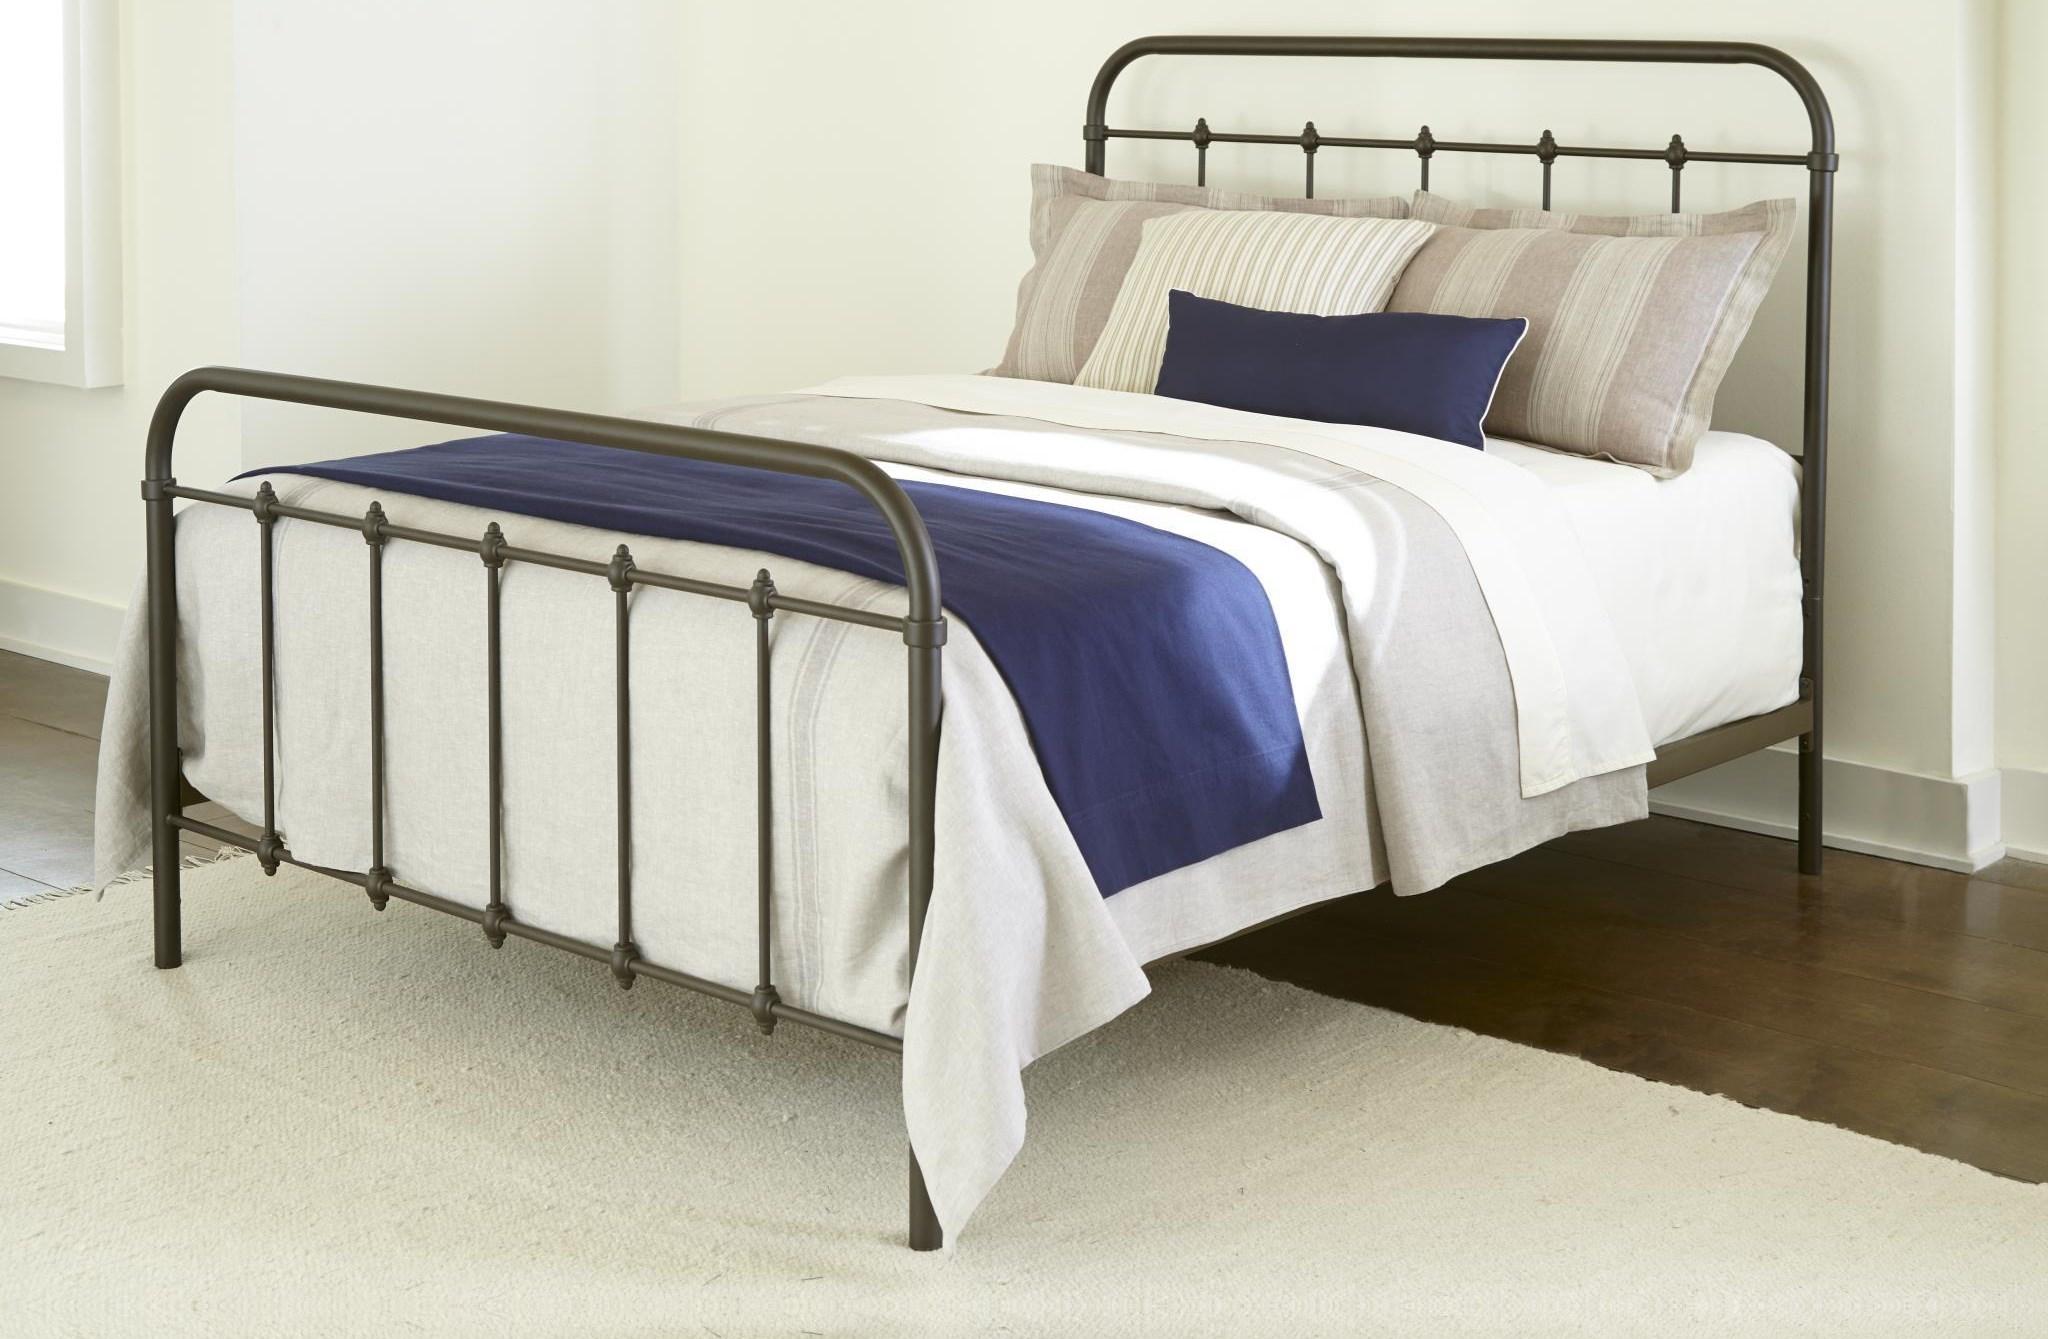 232Grey Full Size Metal Bed by Kith Furniture at Furniture Fair - North Carolina